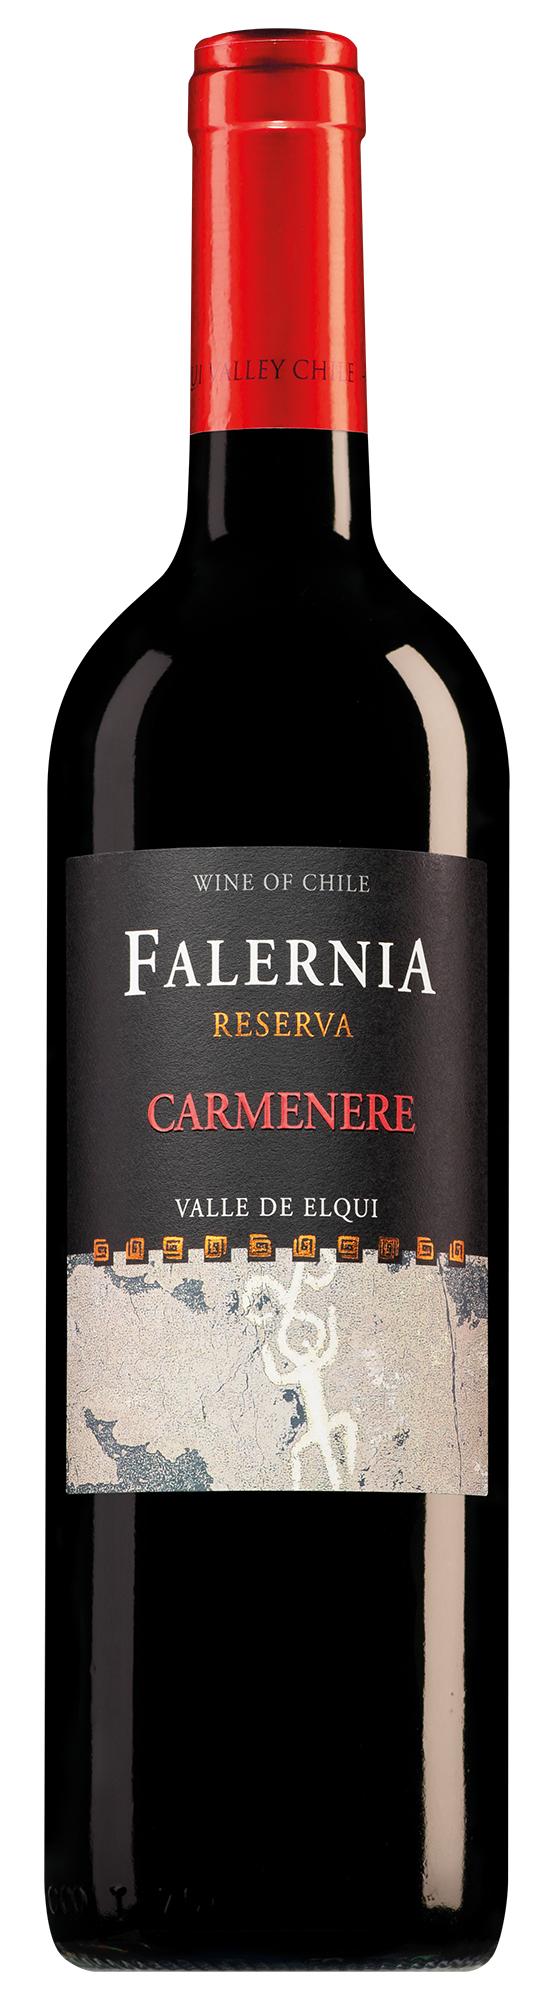 Viña Falernia Elqui Valley Carmenère Reserva